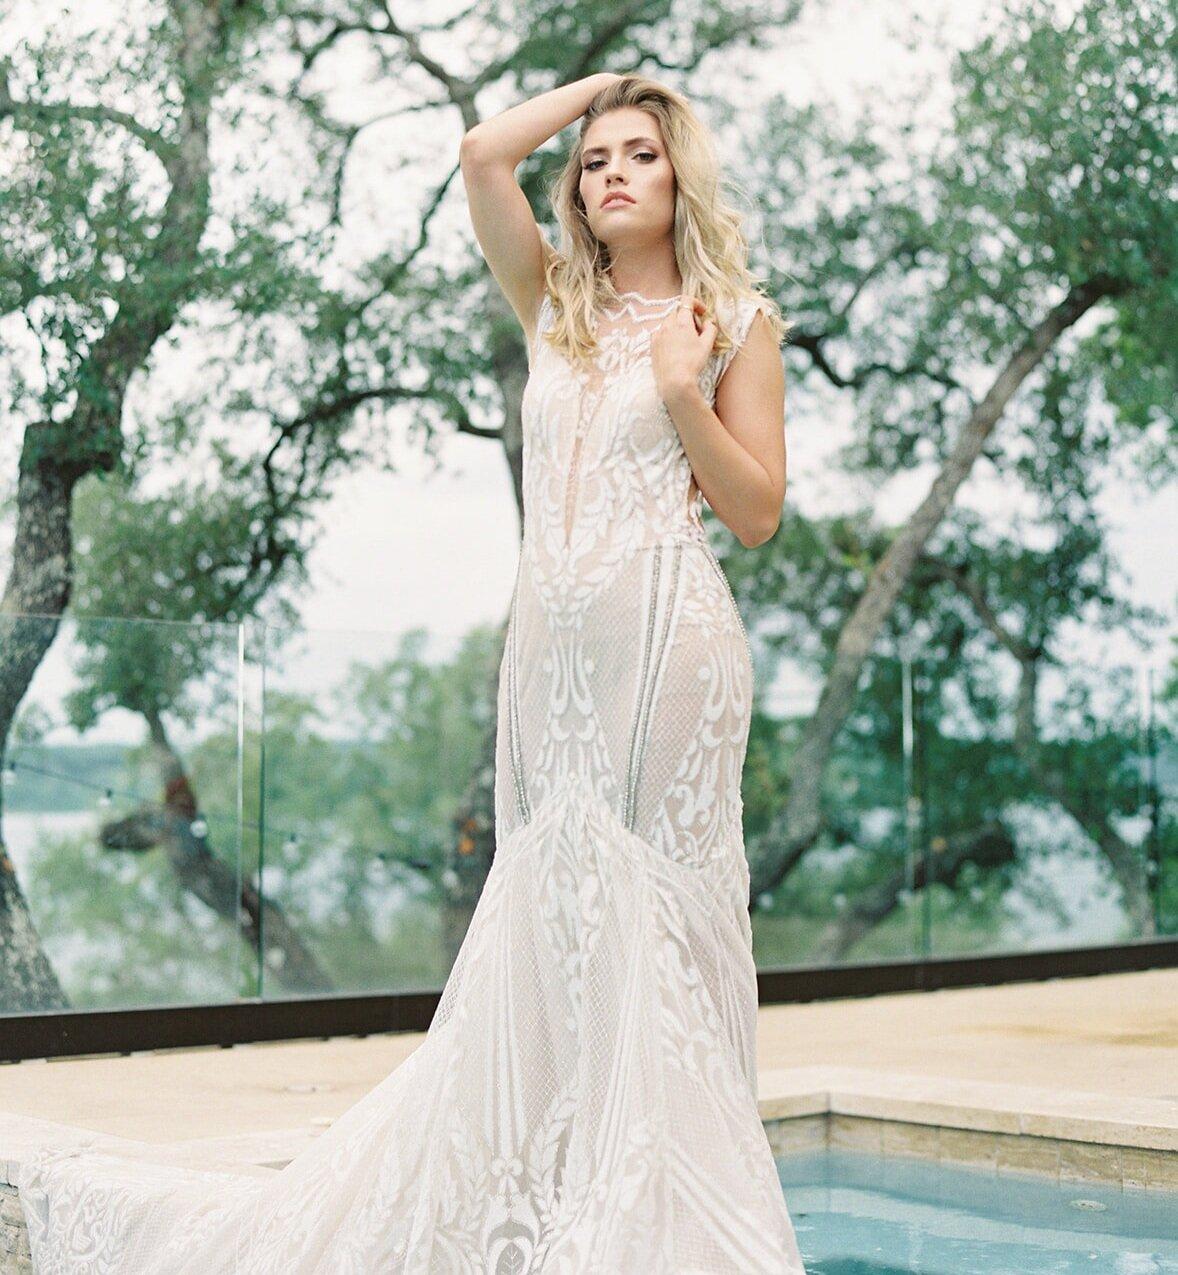 Austin_Editorial-Carrie_King_Photographer-43.jpg